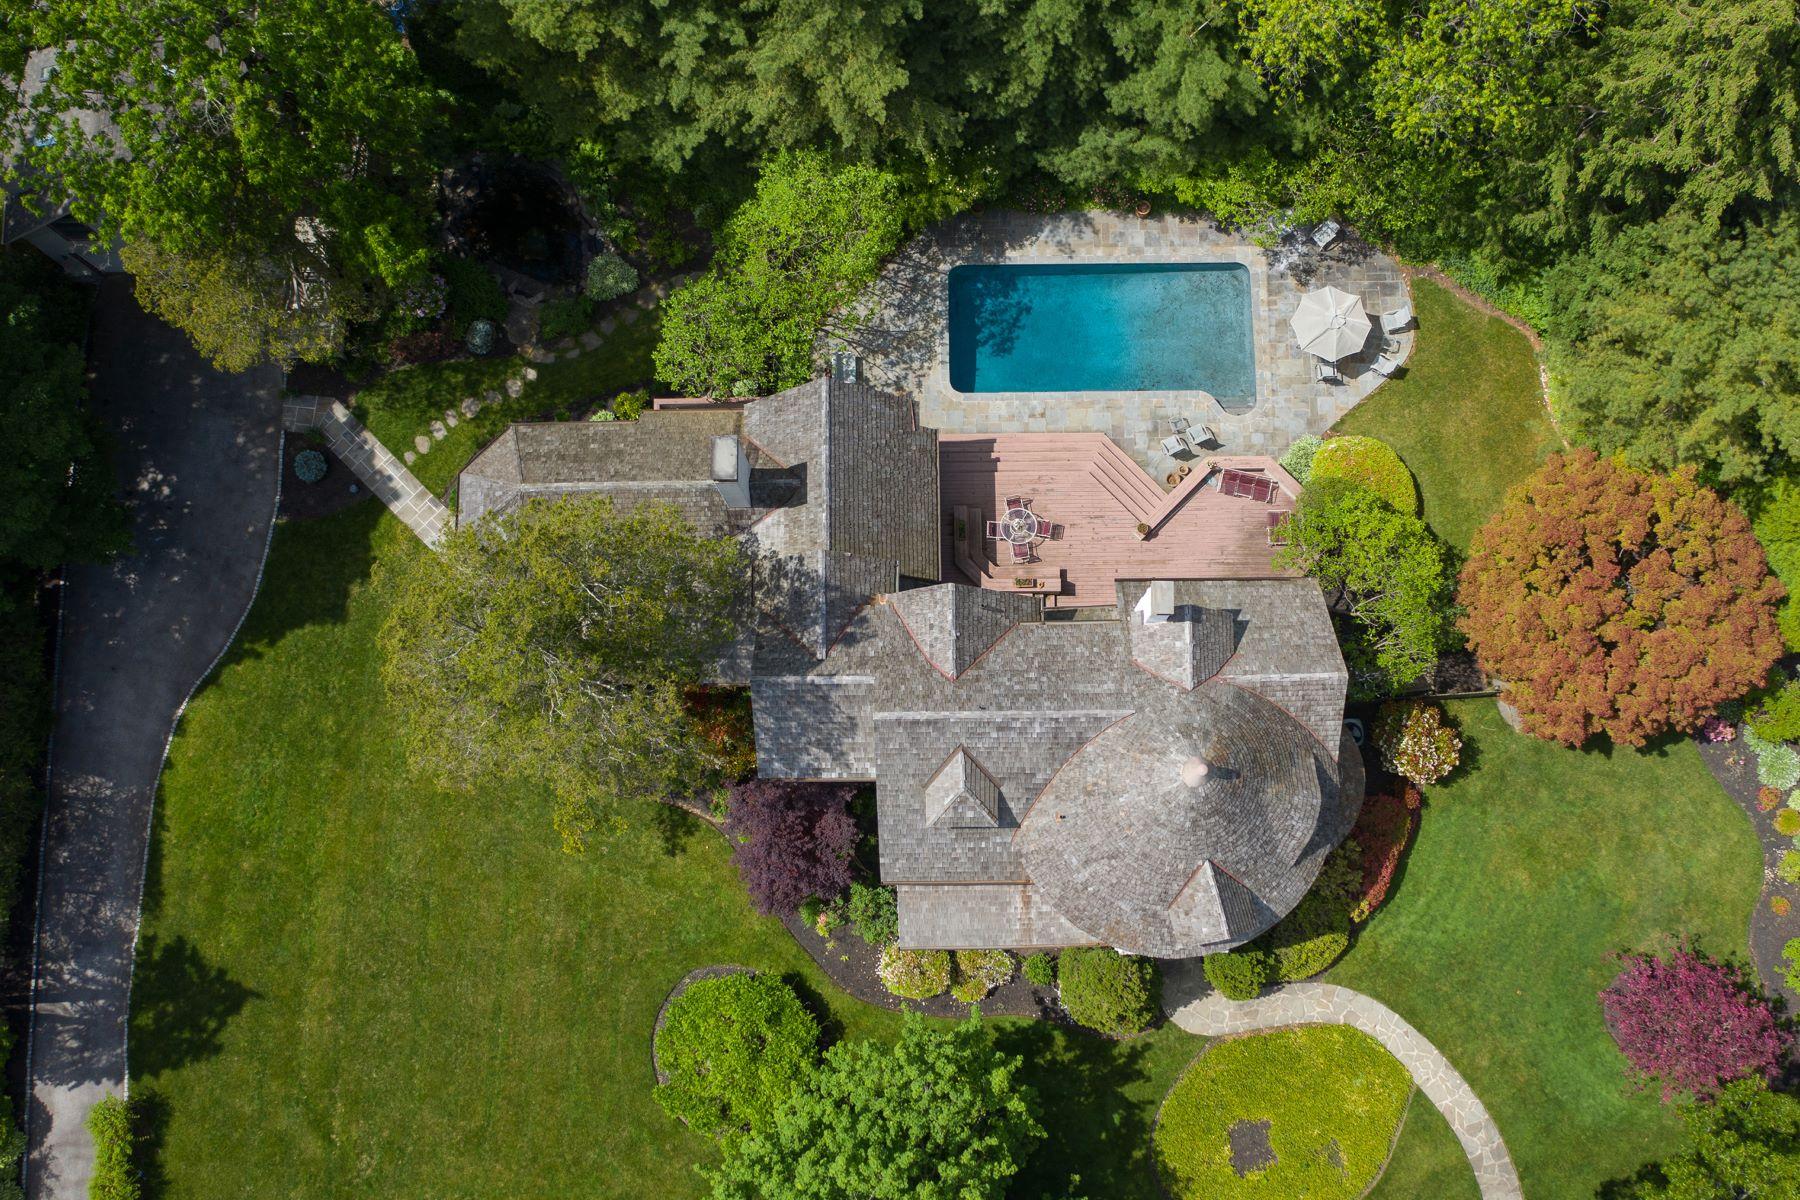 Single Family Homes for Sale at 131 E BEECHTREE LN Wayne, Pennsylvania 19087 United States